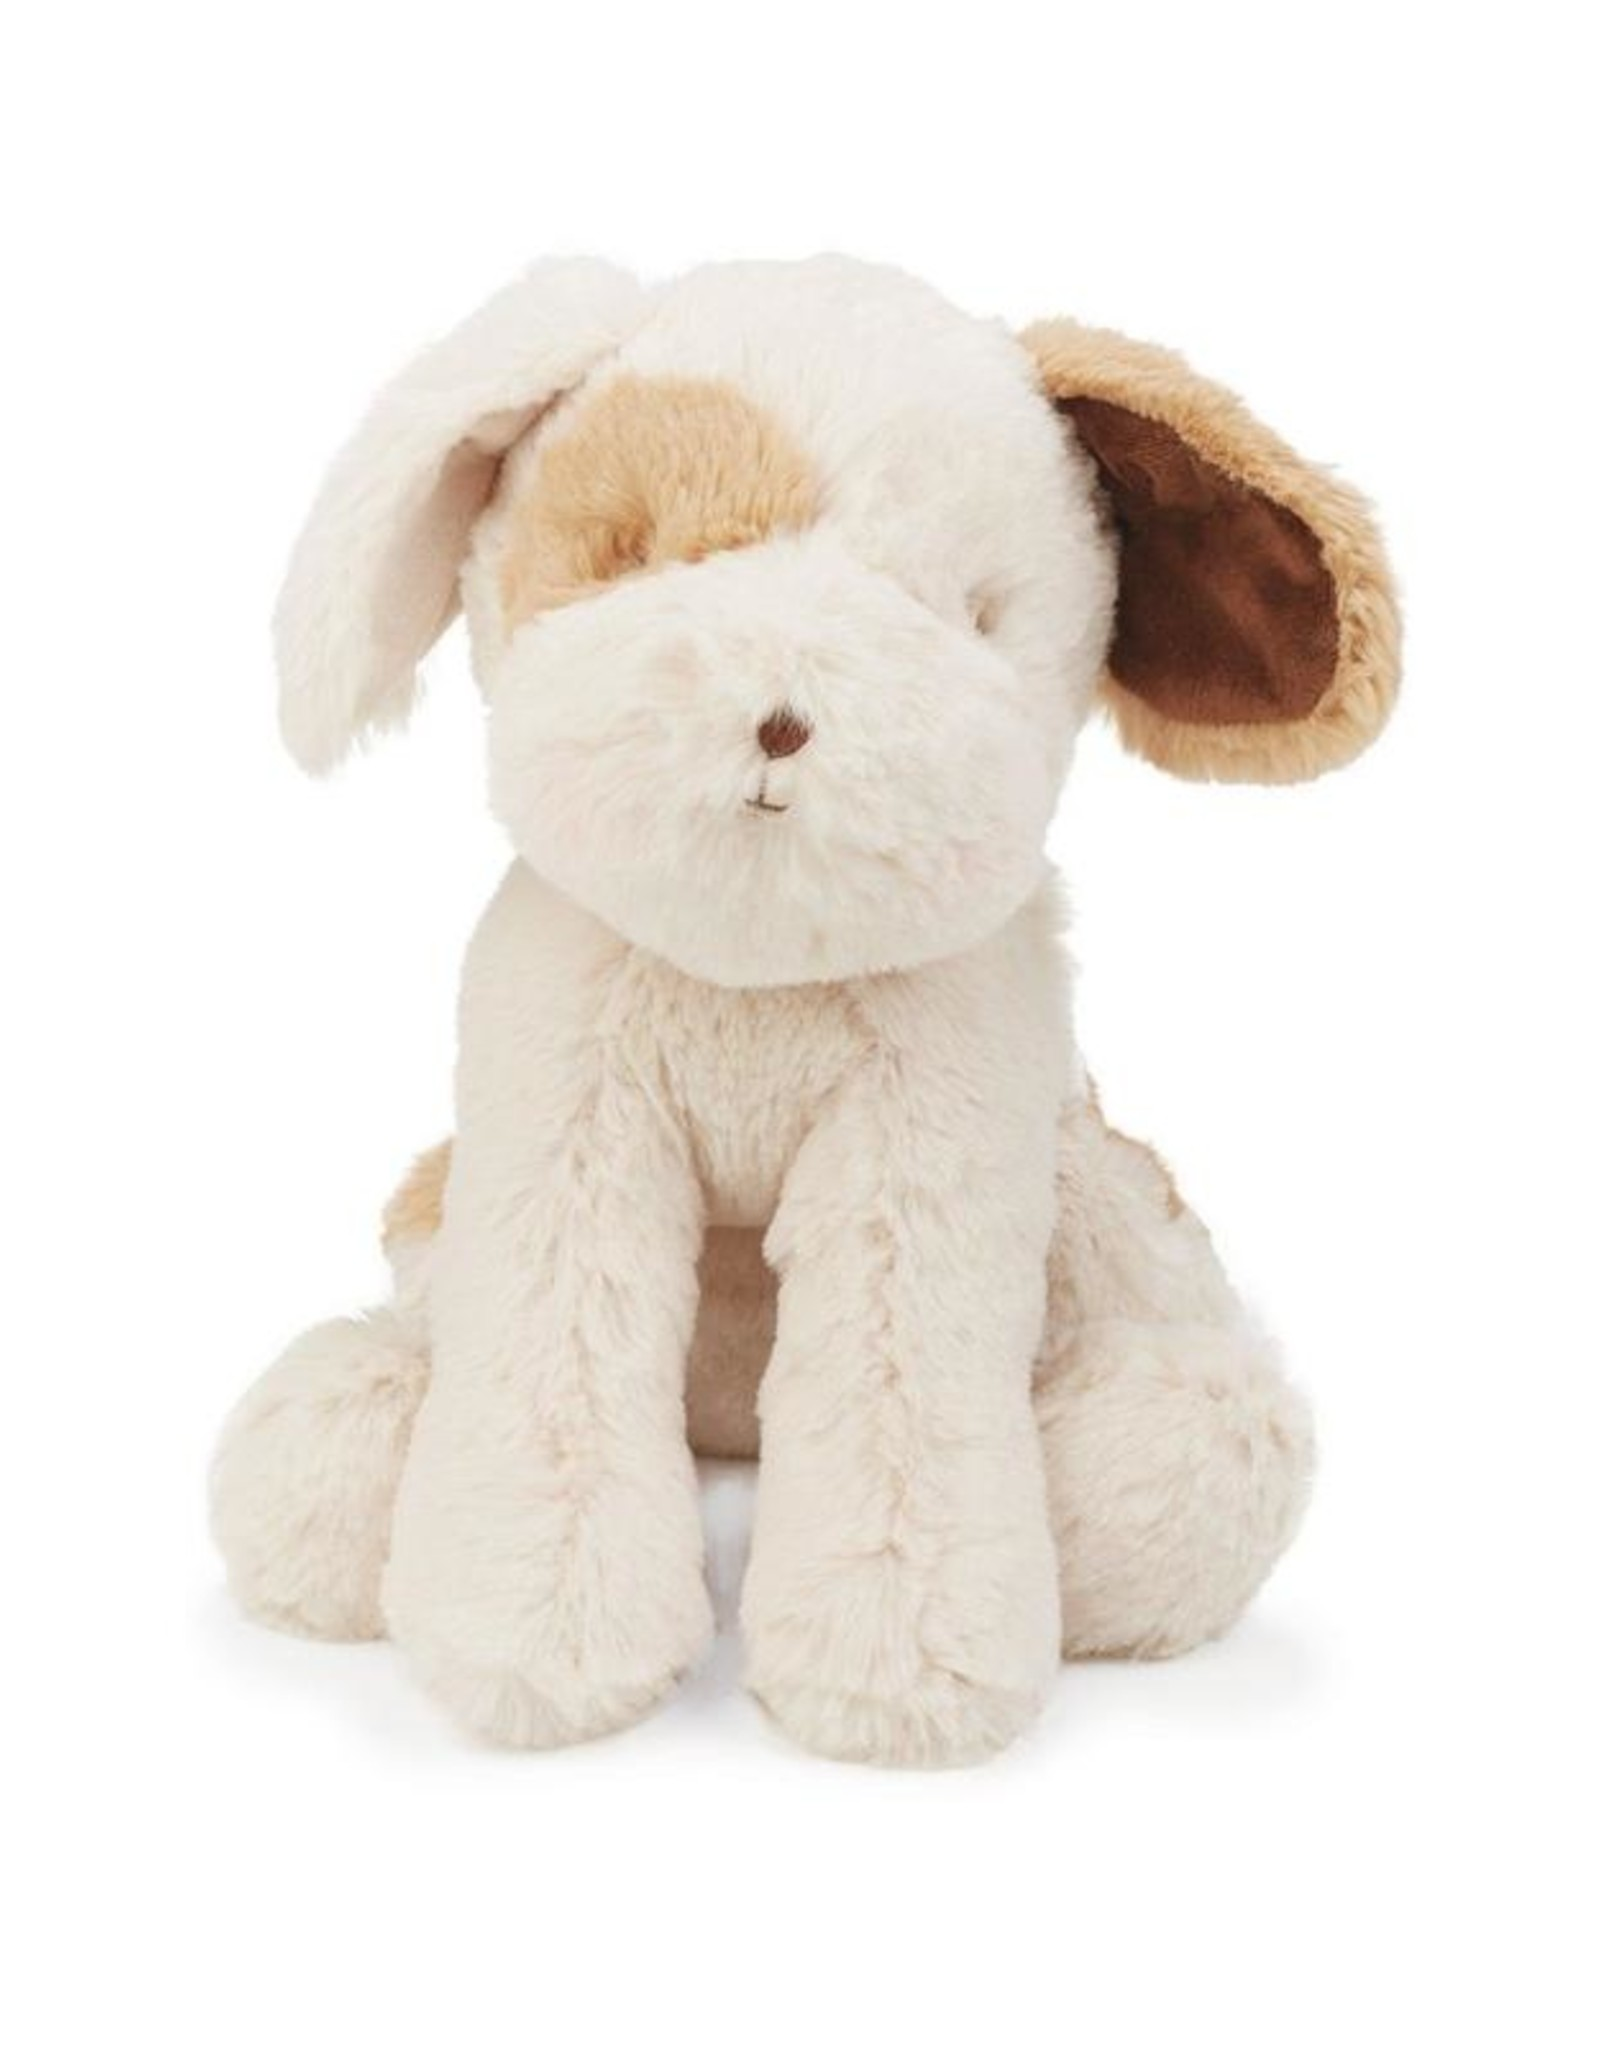 Little Skipit Plush Puppy